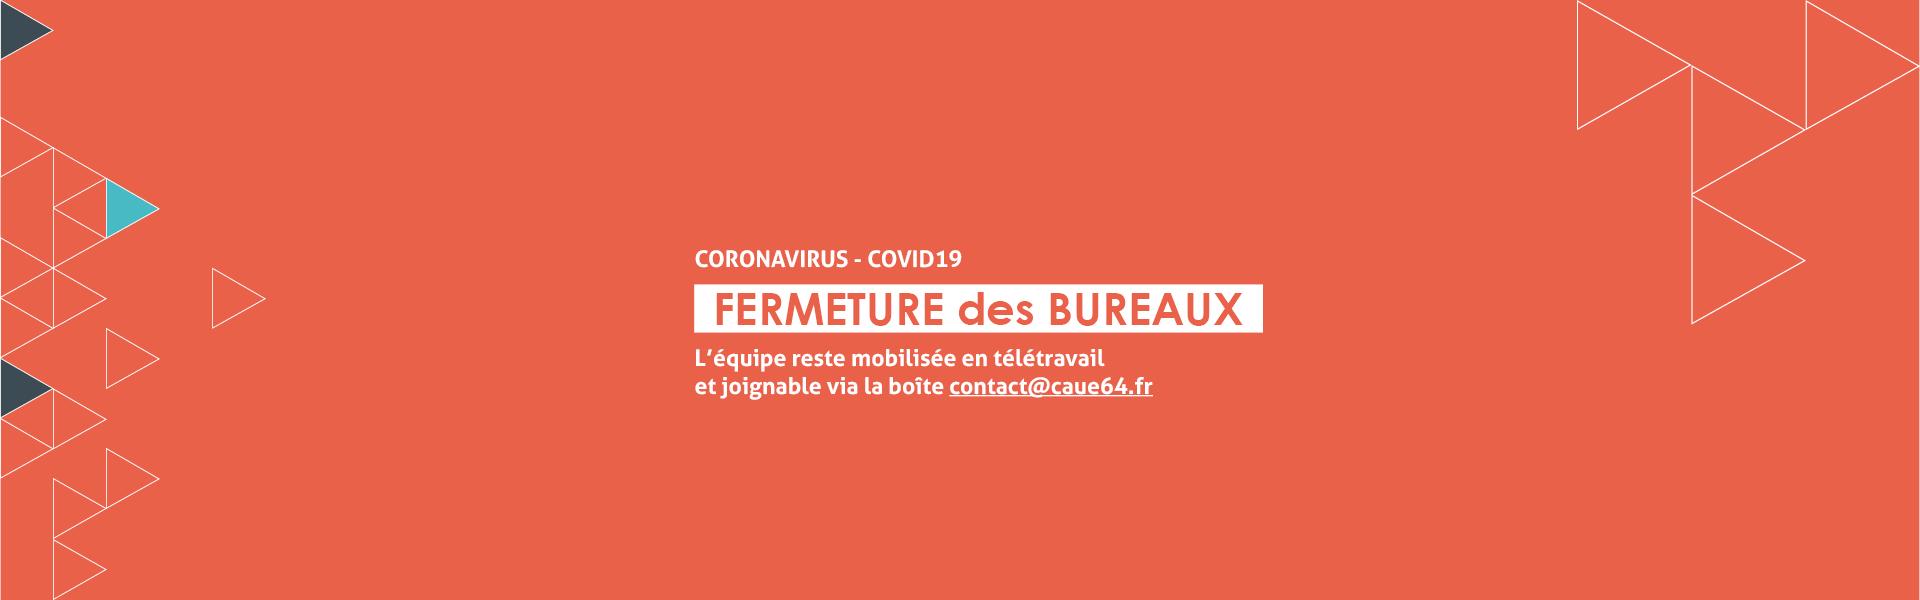 Urgence sanitaire COVID-19 - Fermeture du CAUE